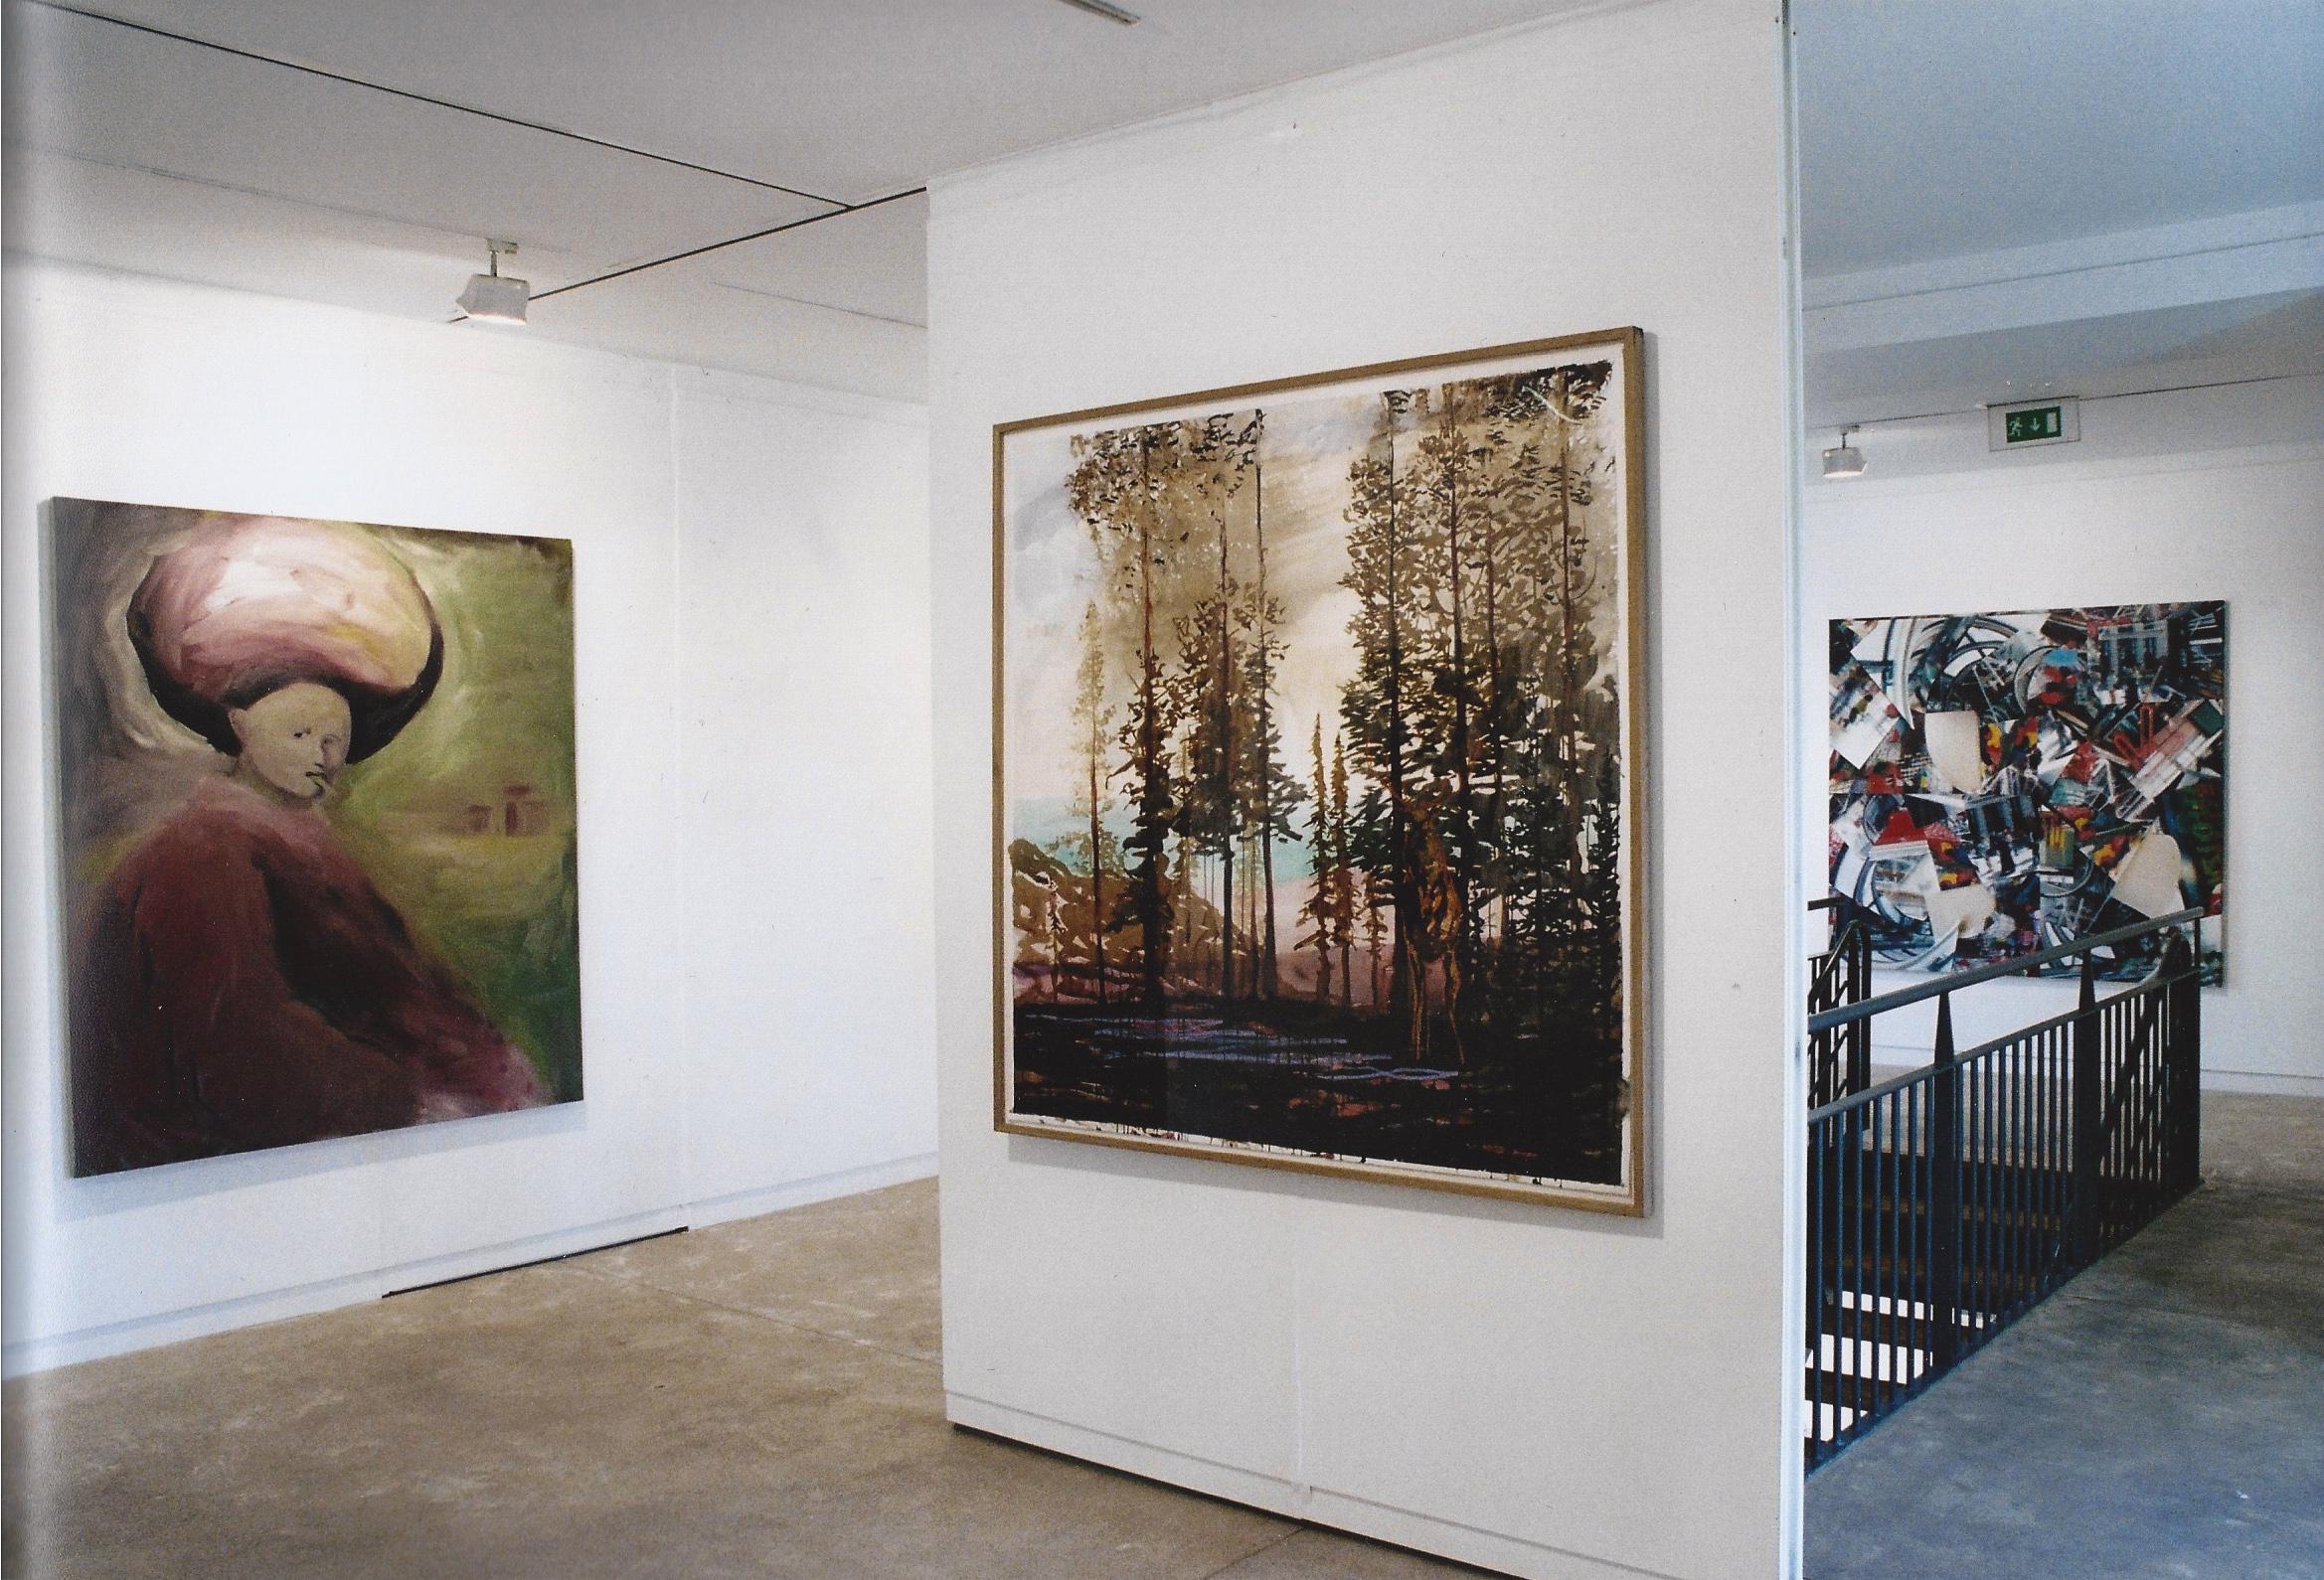 Etats de Peinture , Maison des Arts de Malakoff (FR)2003. Curator Philippe Piguet.Artists in view : Gregory Forstner, Olivier Masmonteil, Duncan Wylie